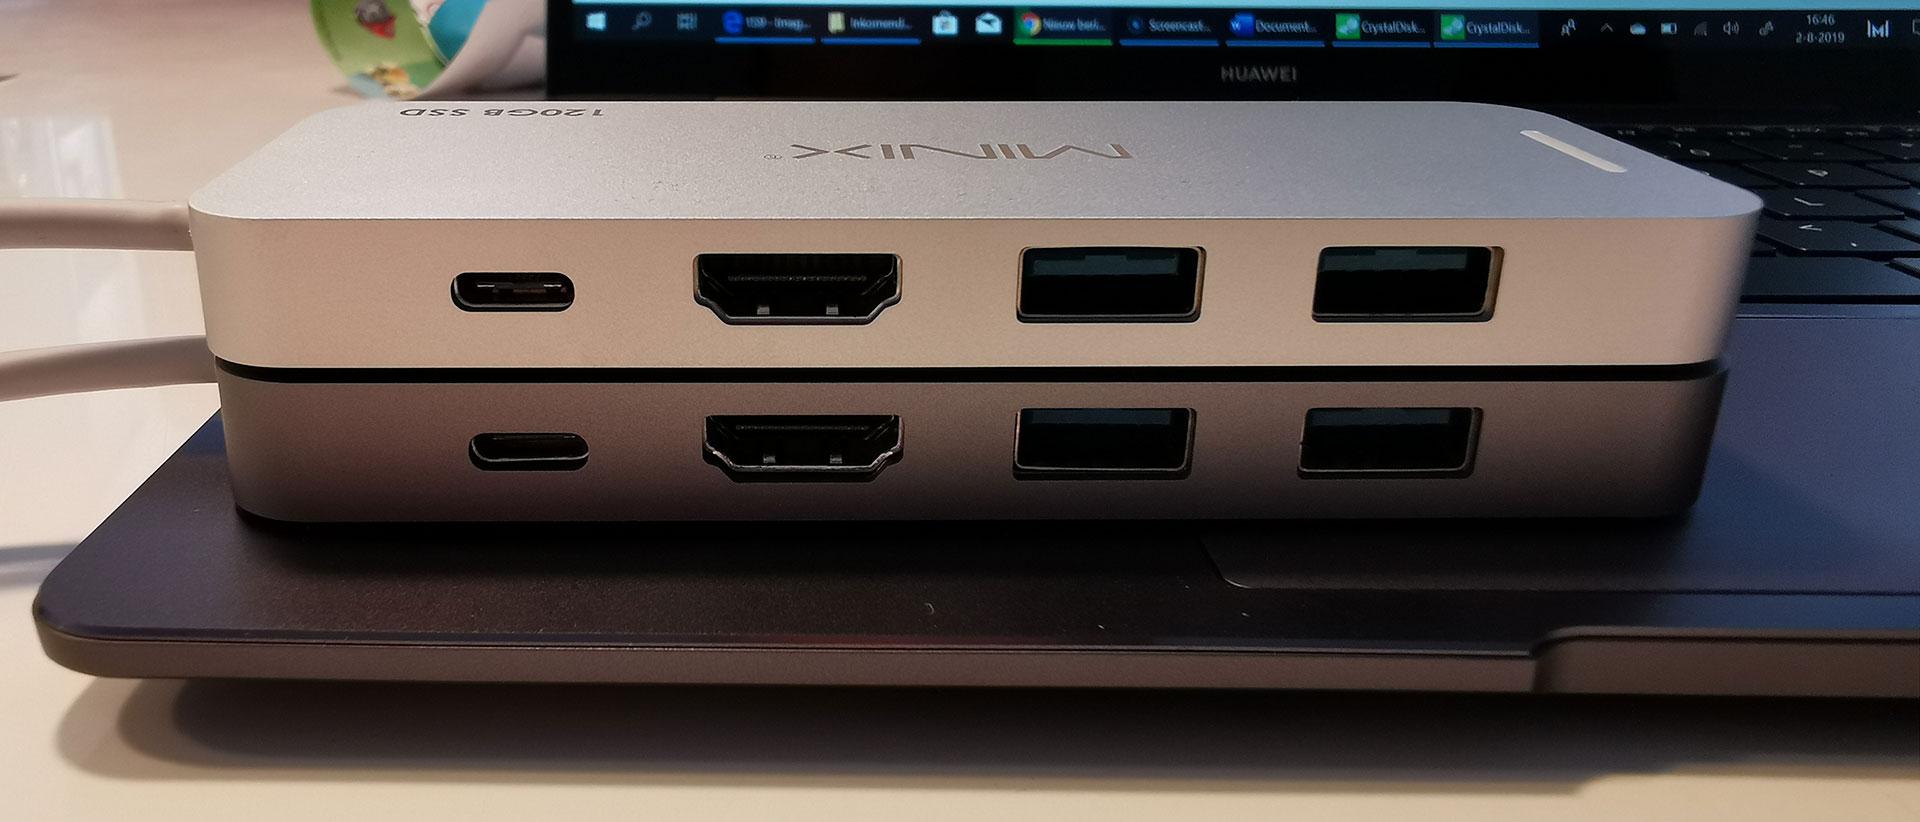 Minix USB-C Multiport Storage Hub Kleuren